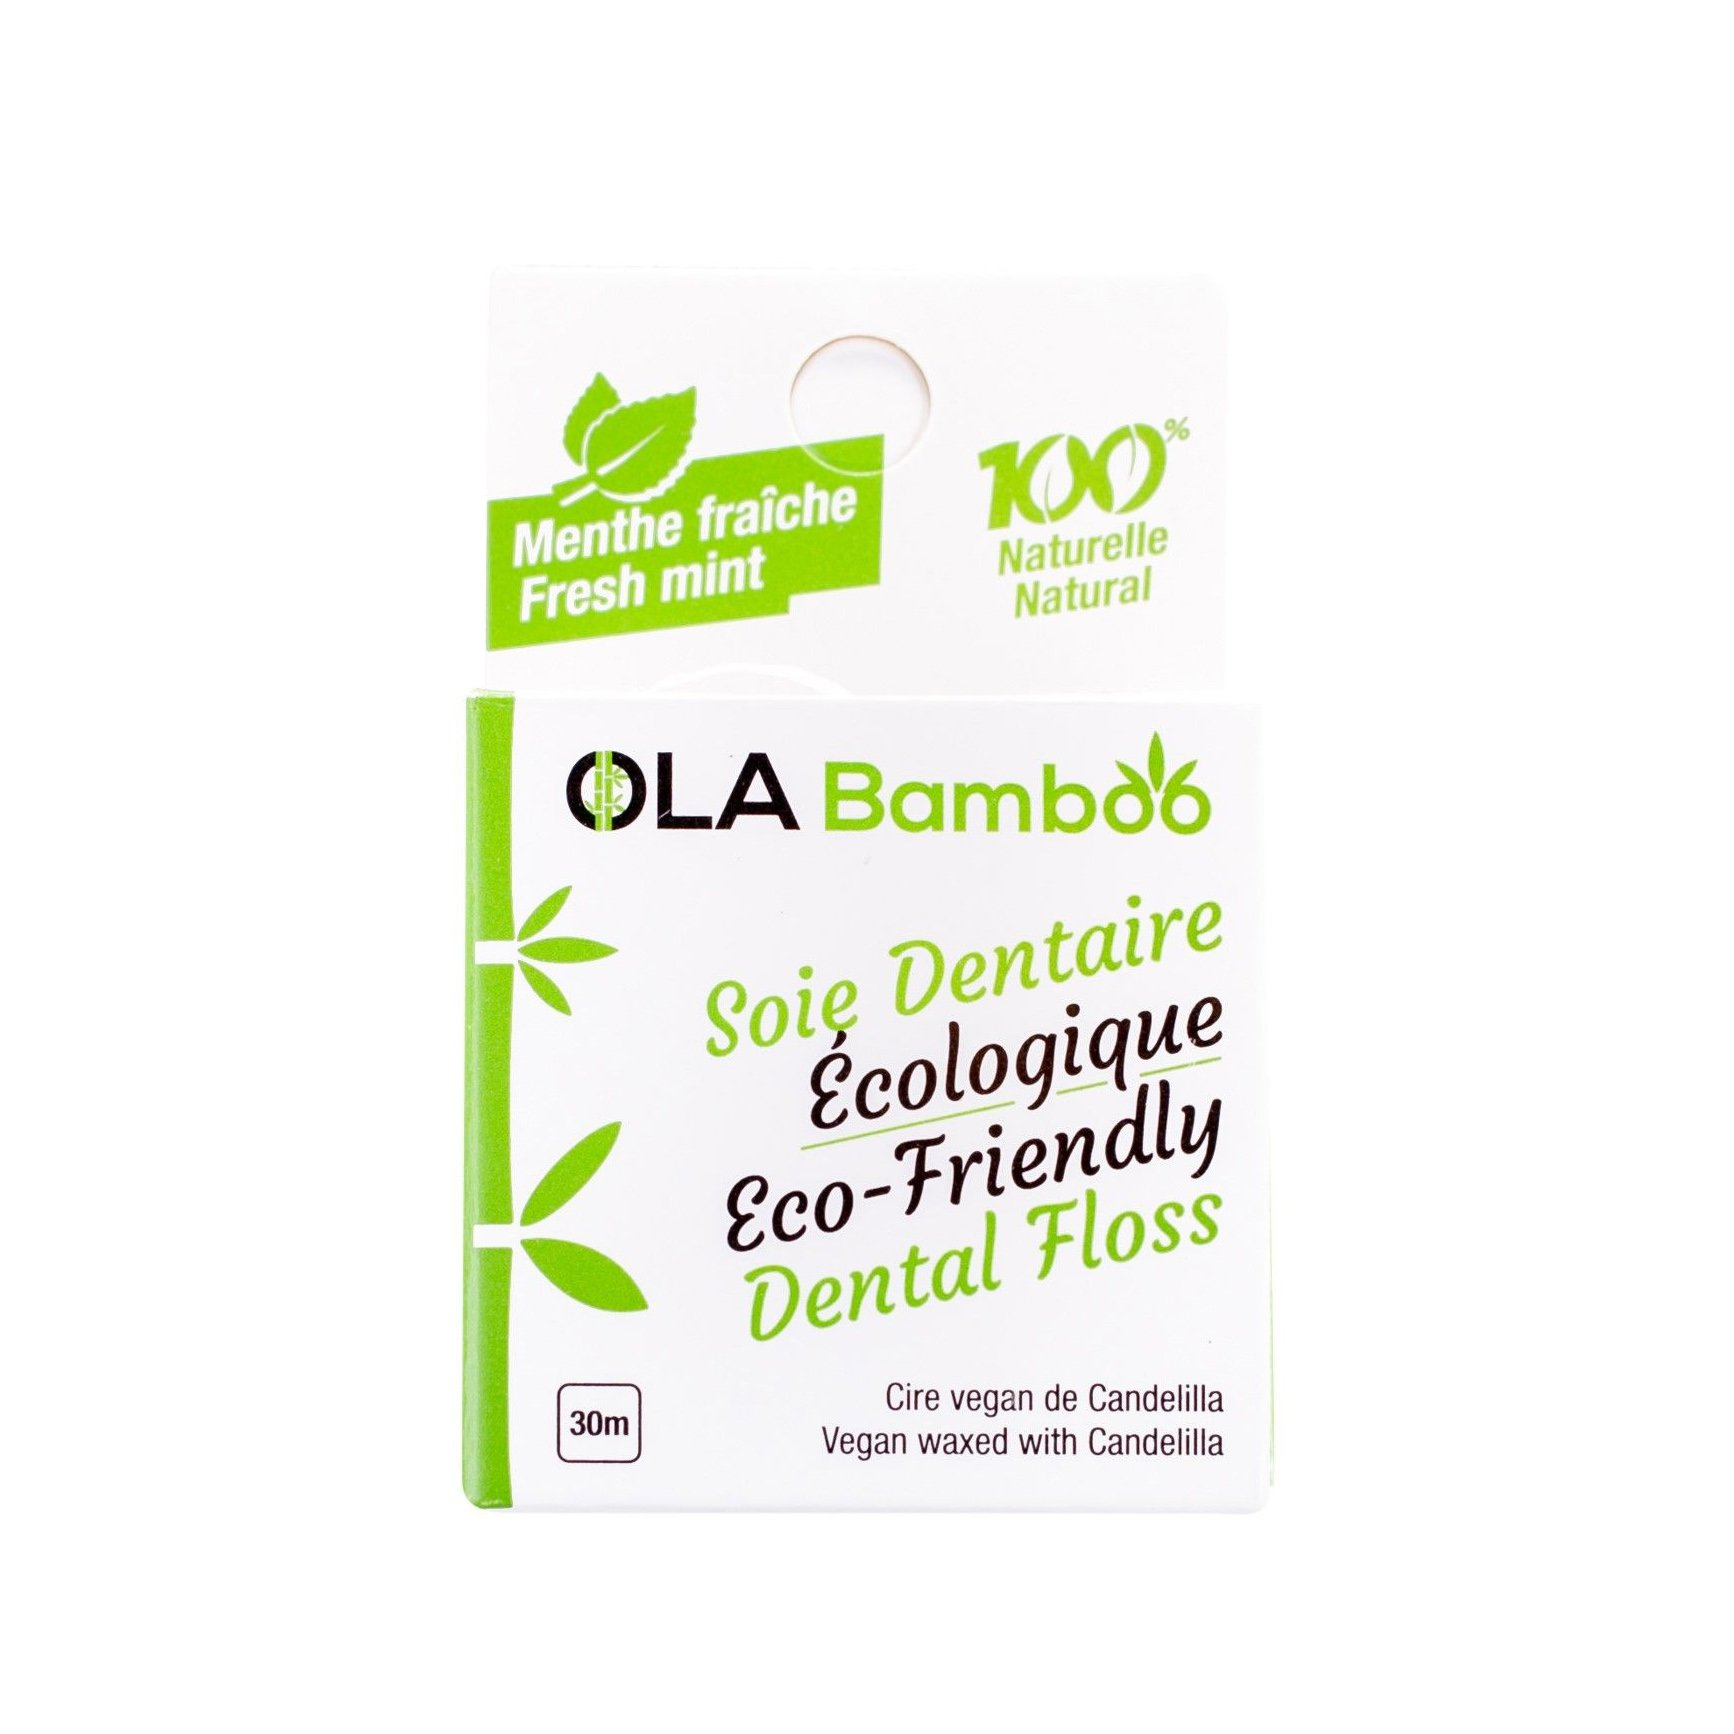 OLABamboo Eco-Friendly Dental Floss Φυσικό Οδοντικό Ρολό Νήματος 30m 1 Τεμάχιο